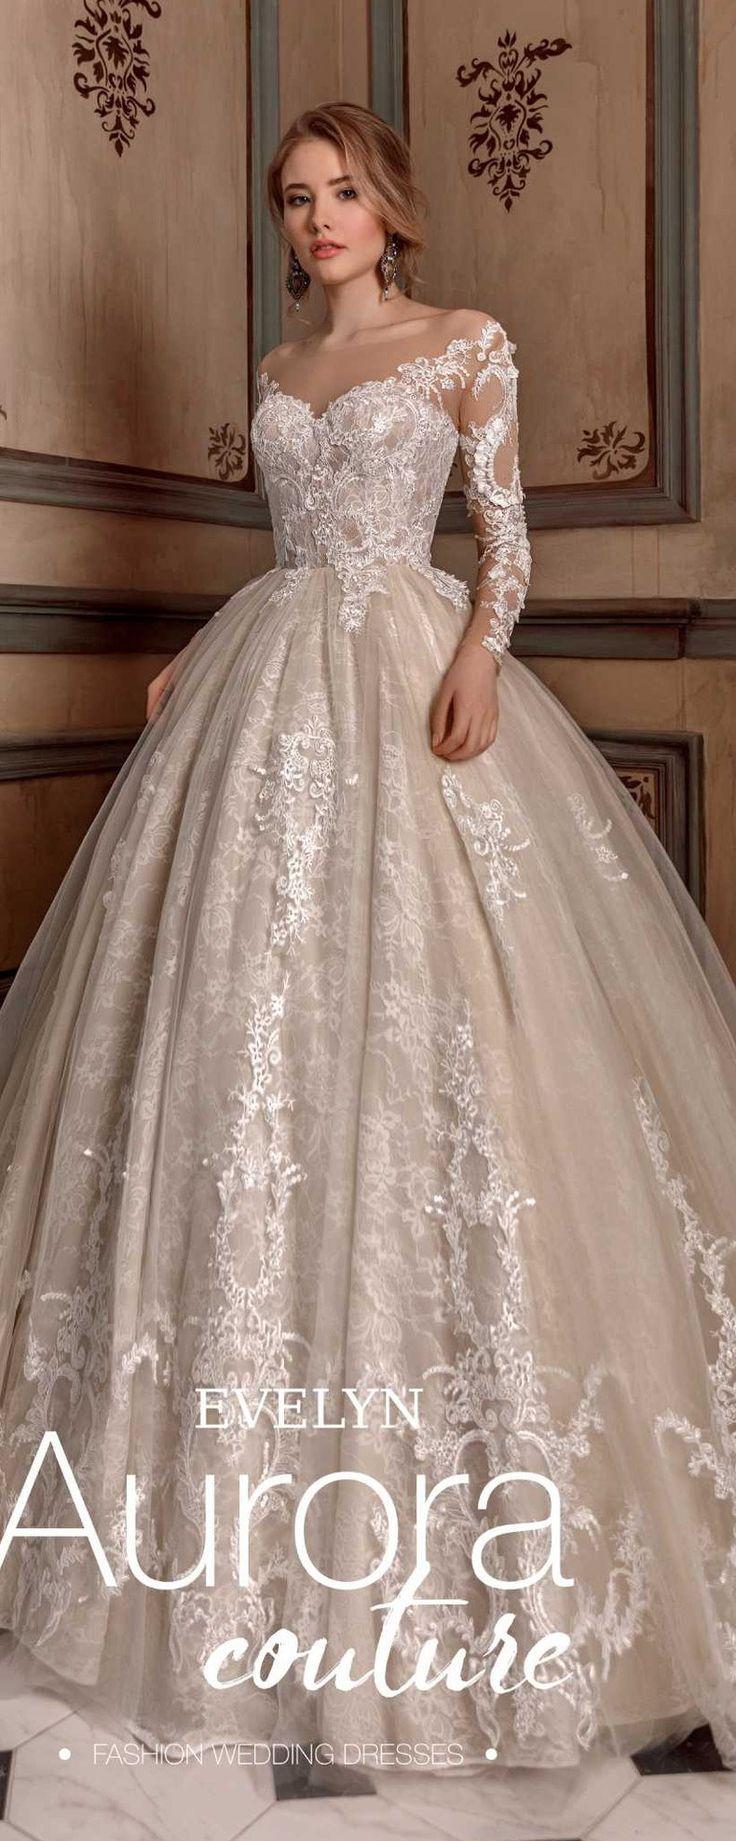 Ball gown wedding dress evelyn wedding dresses bridal dress